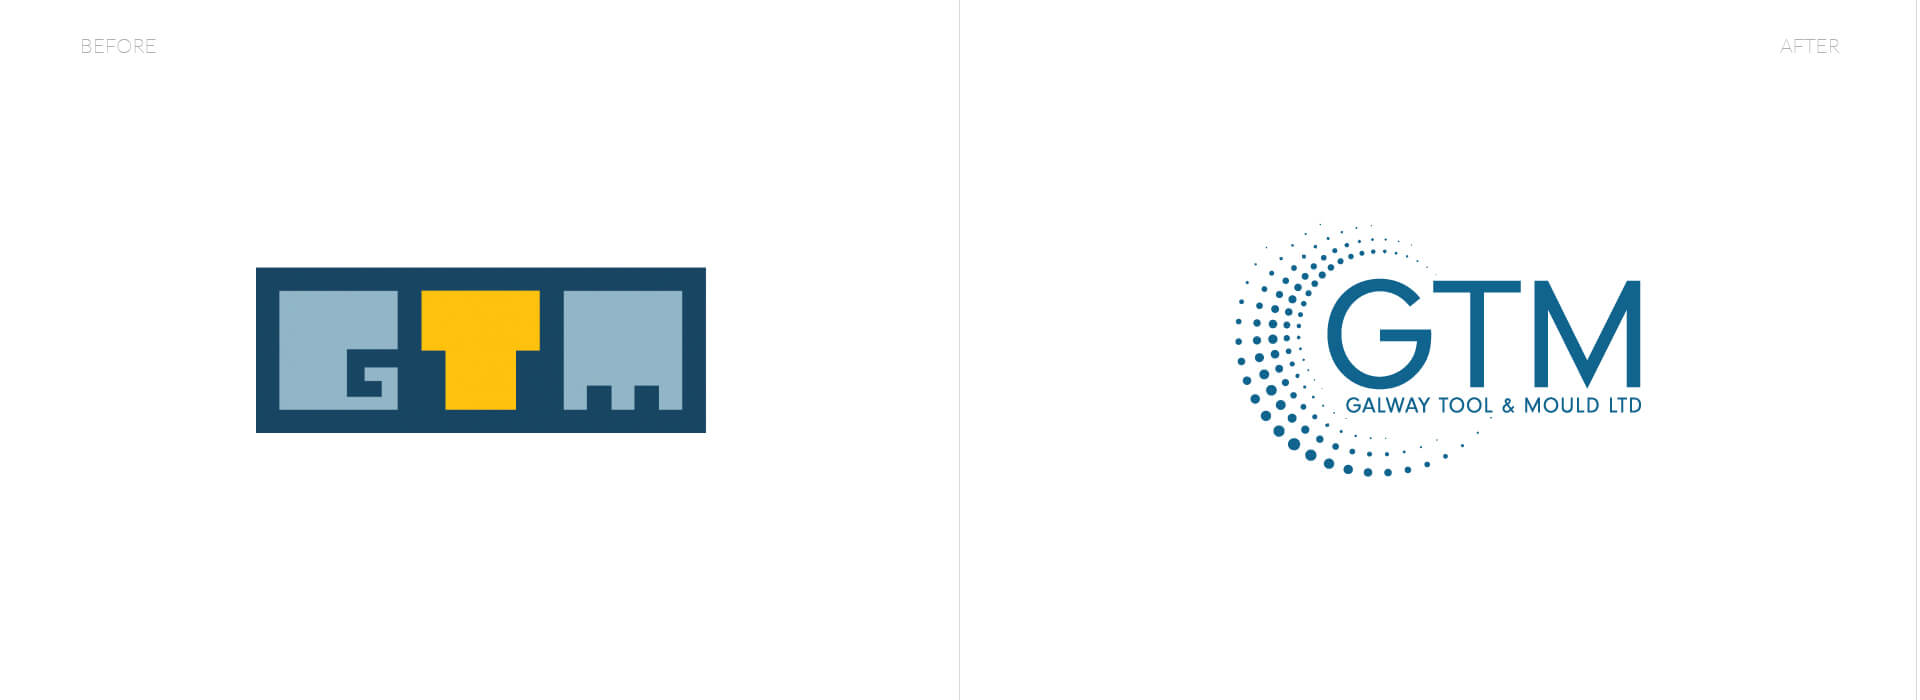 GTM logo evolution